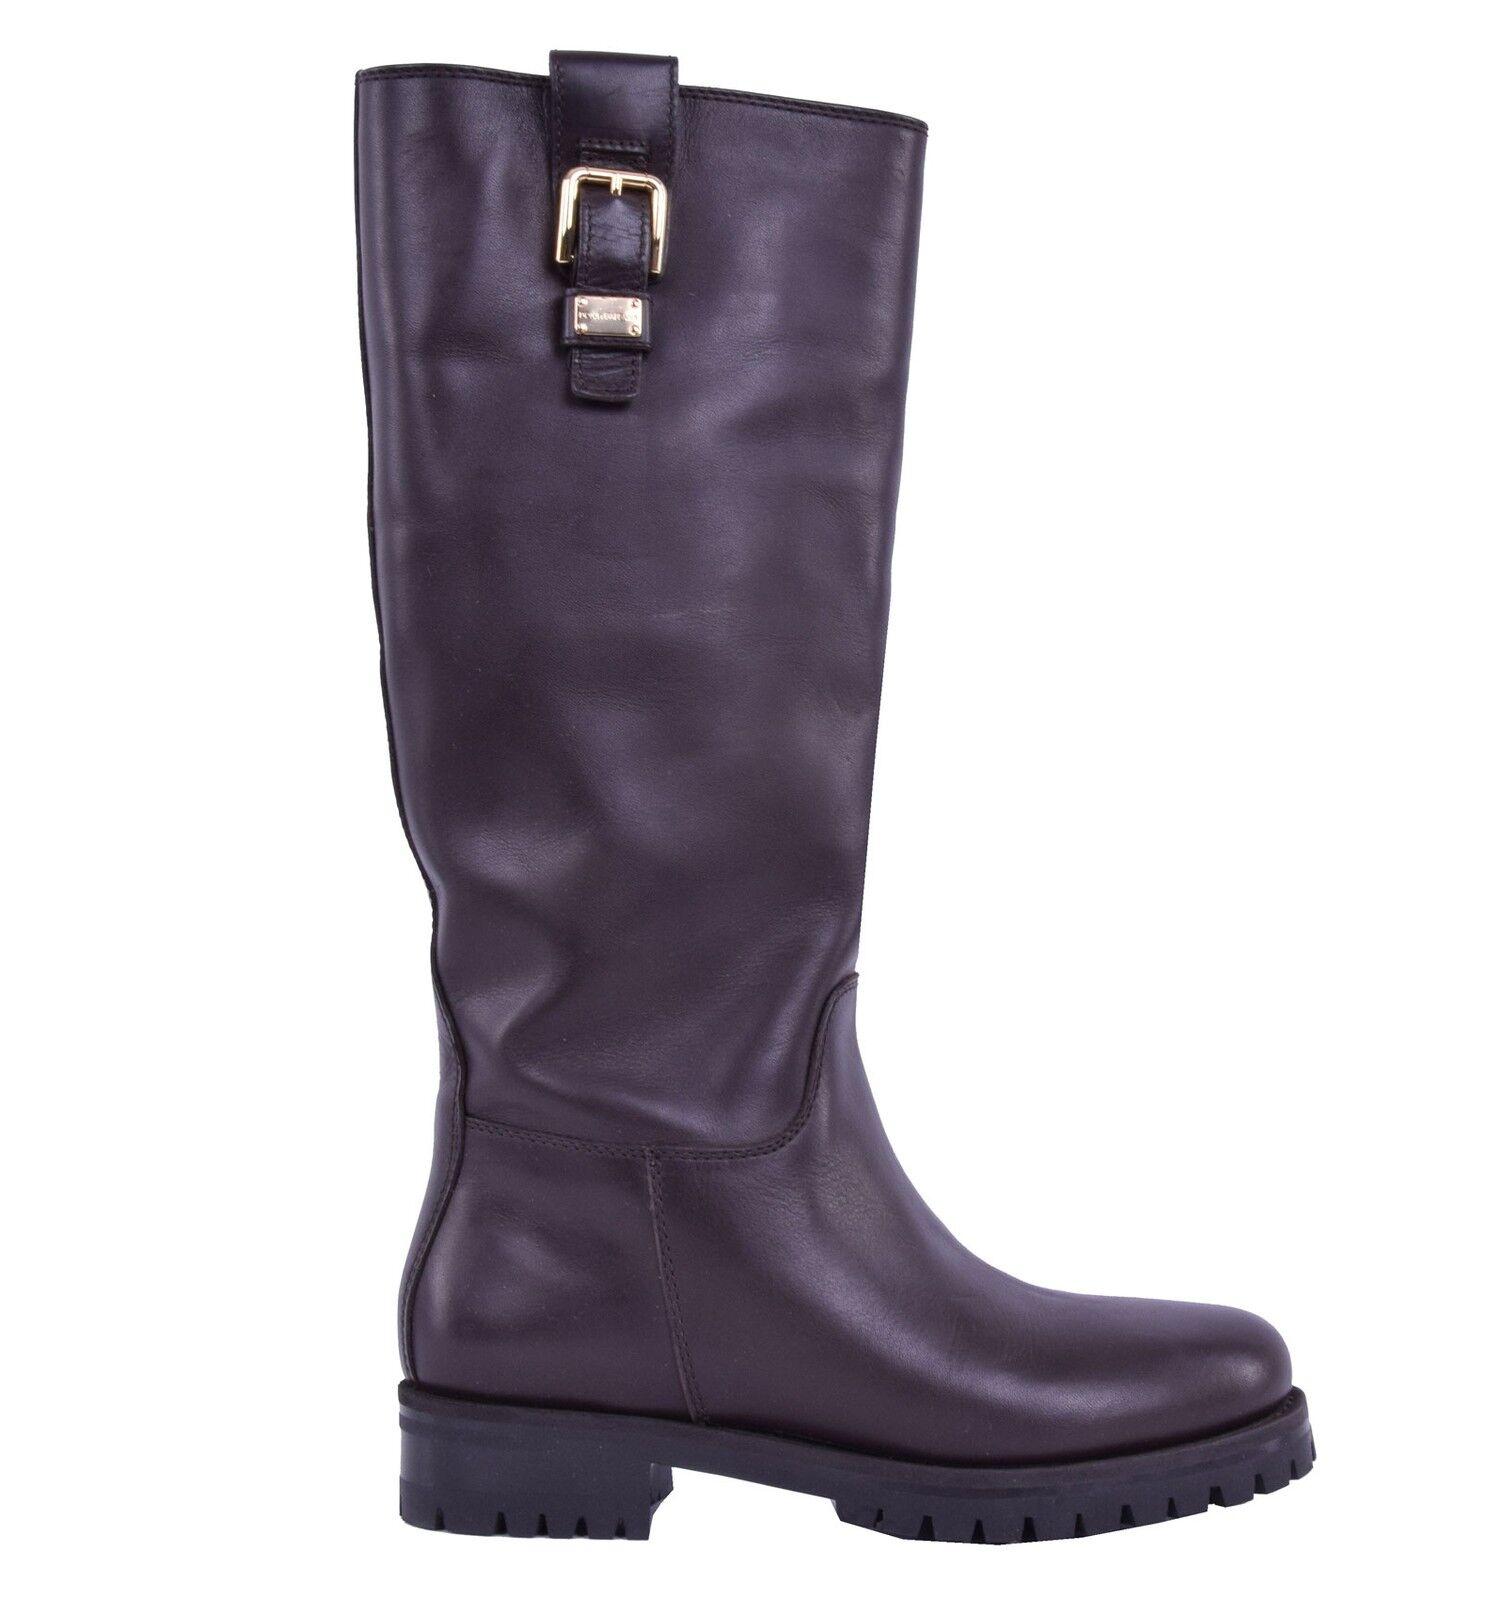 DOLCE Stiefel & GABBANA Flache Glattleder Stiefel DOLCE Braun Flat Boots Shoes Brown 04008 8a3cb3